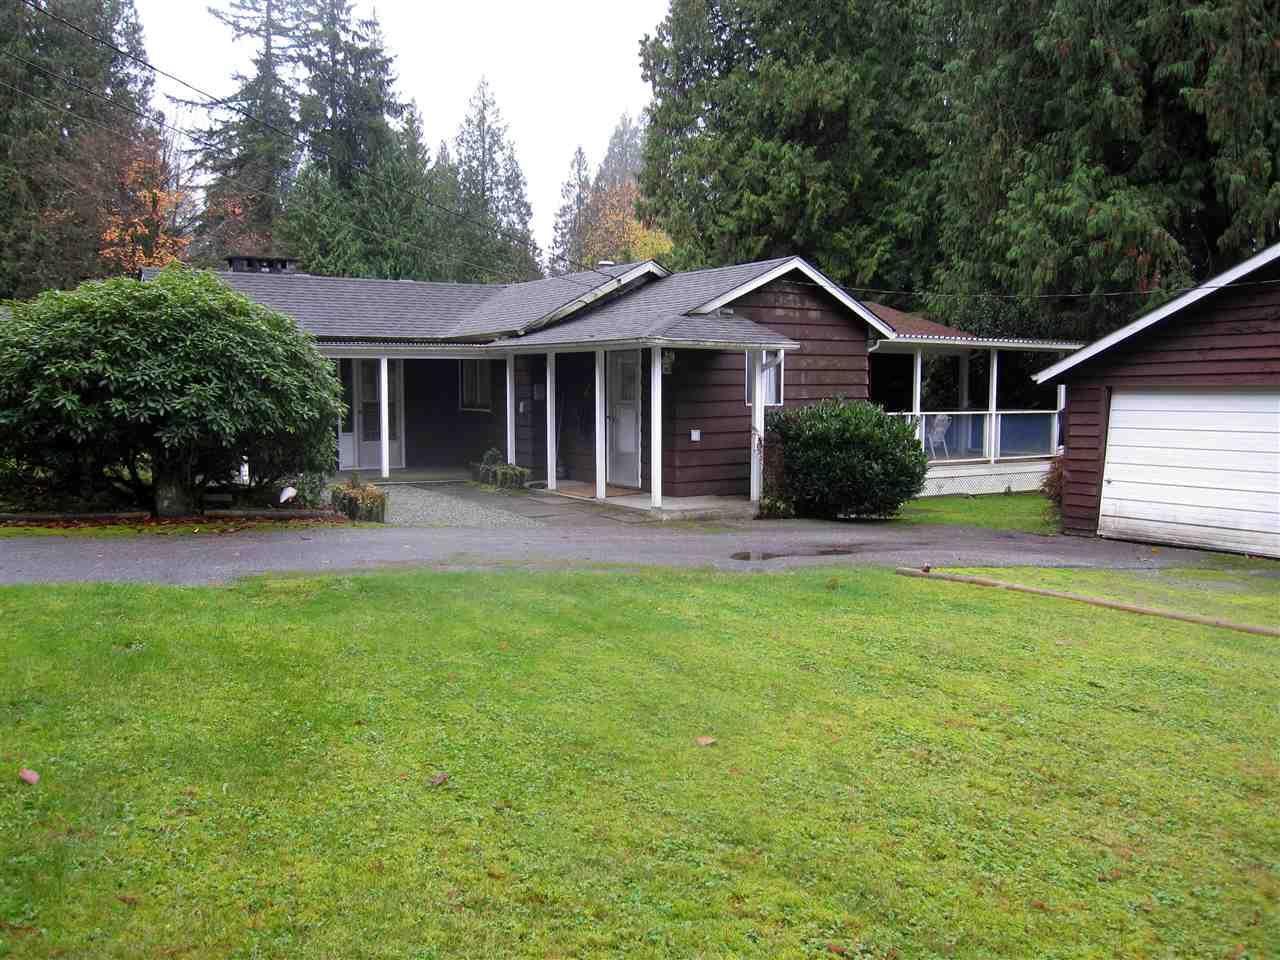 Photo 2: Photos: 11847 267 Street in Maple Ridge: Northeast House for sale : MLS®# R2322069